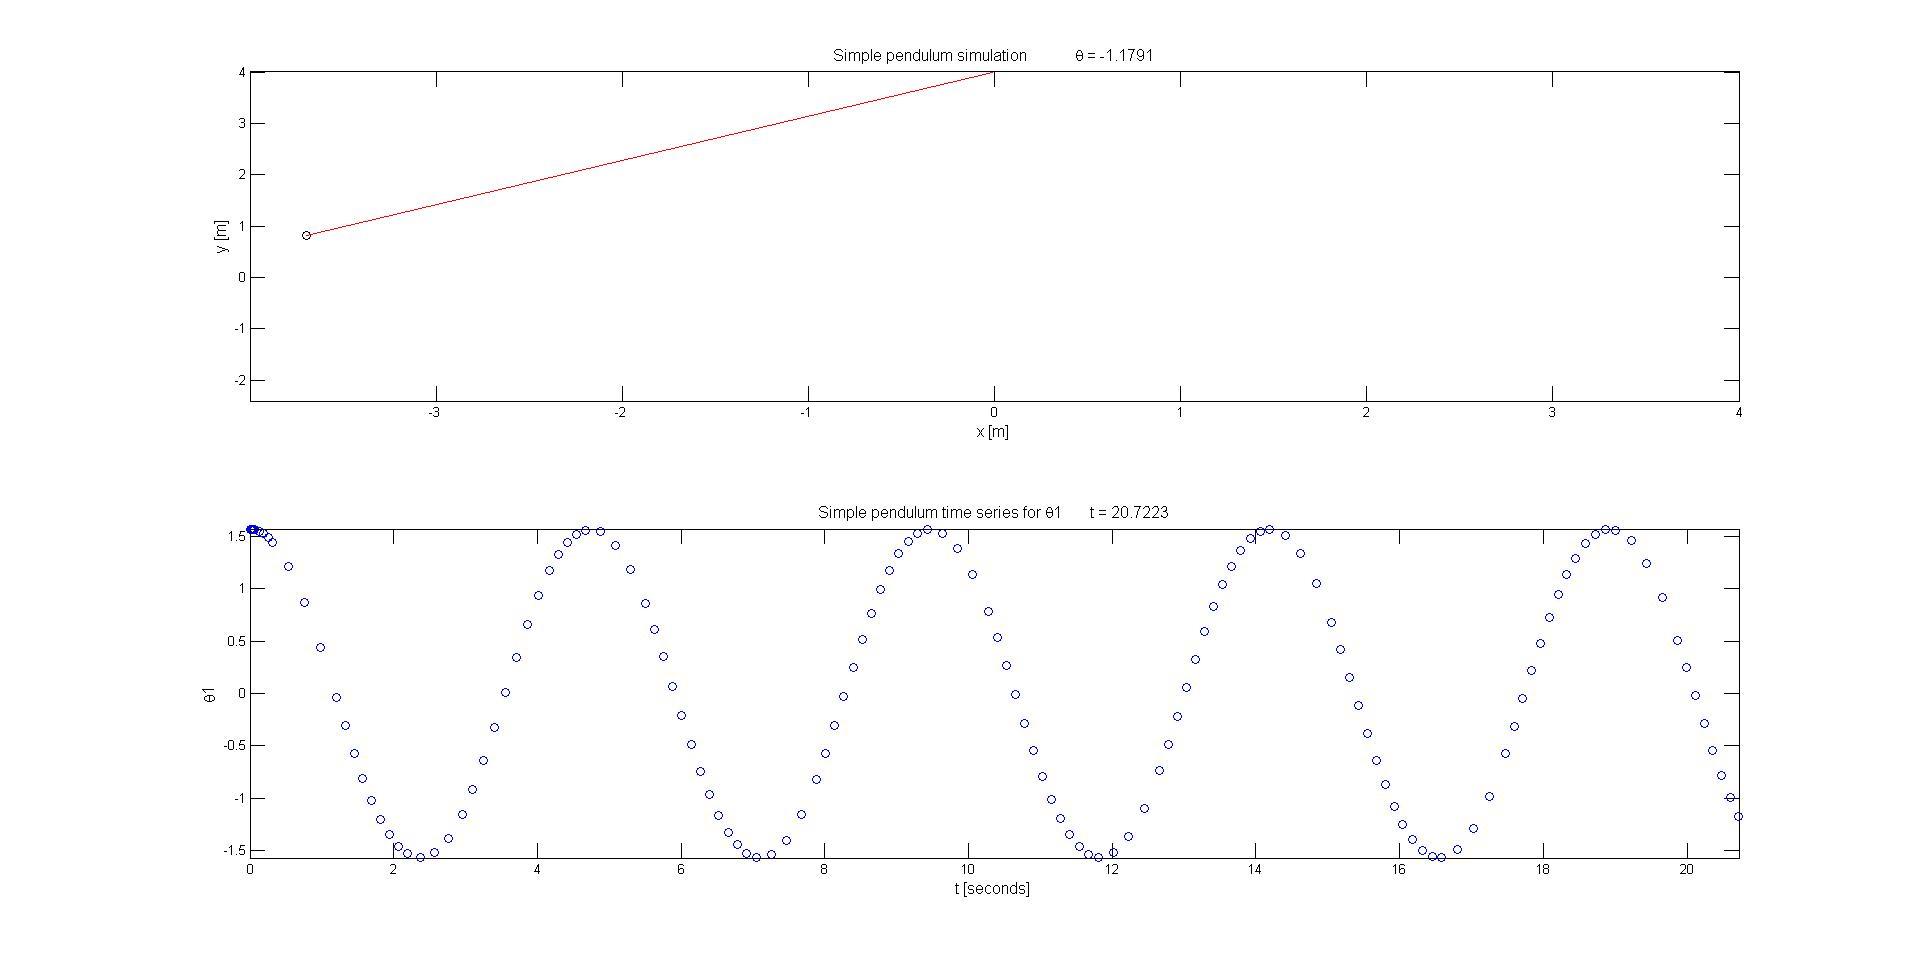 Simple Pendulum Simulation